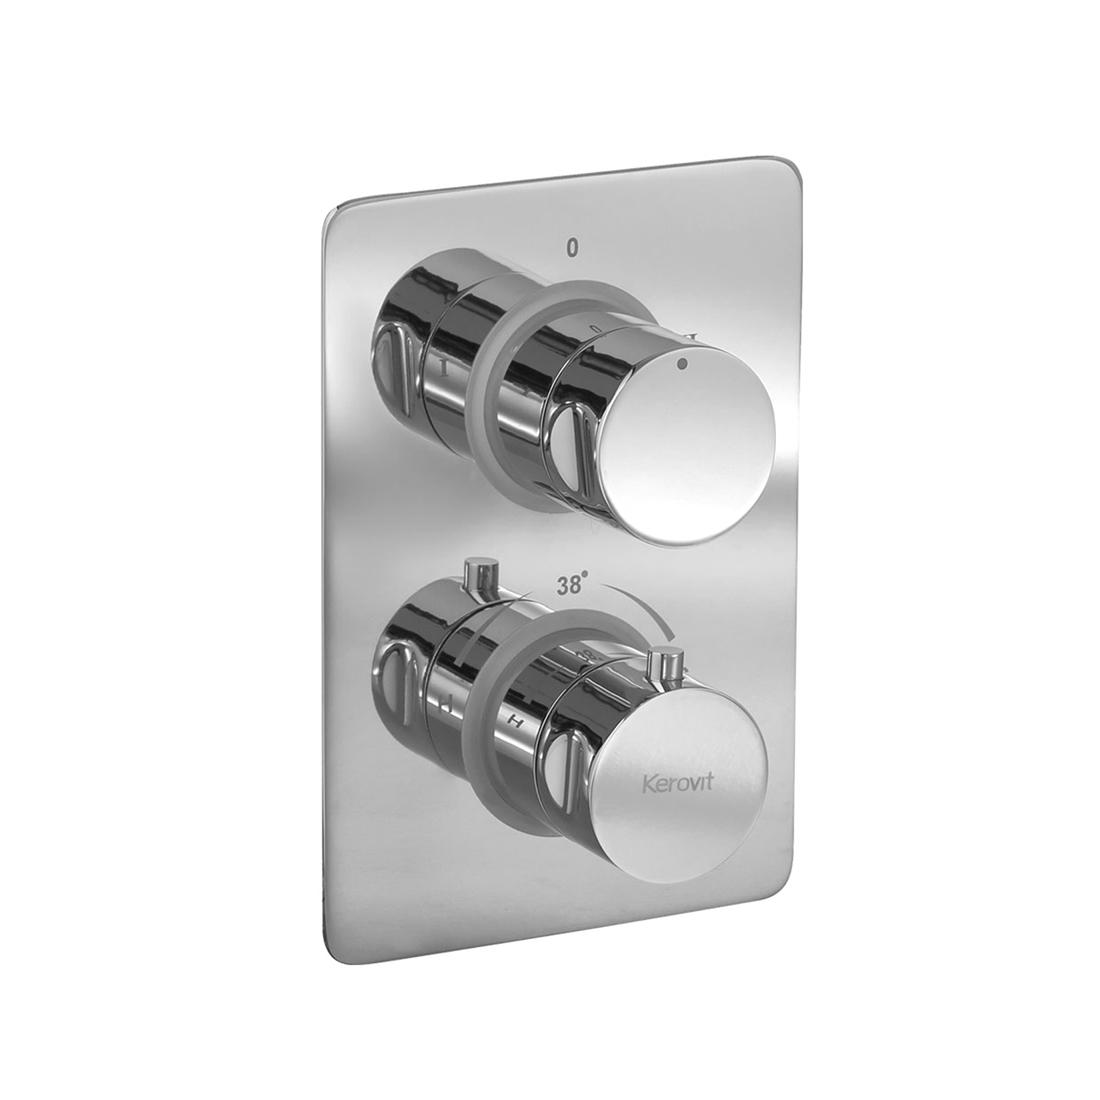 Kerovit KBTHR001 Concealed Hi-Flow Thermostatic Bath and Shower Mixer